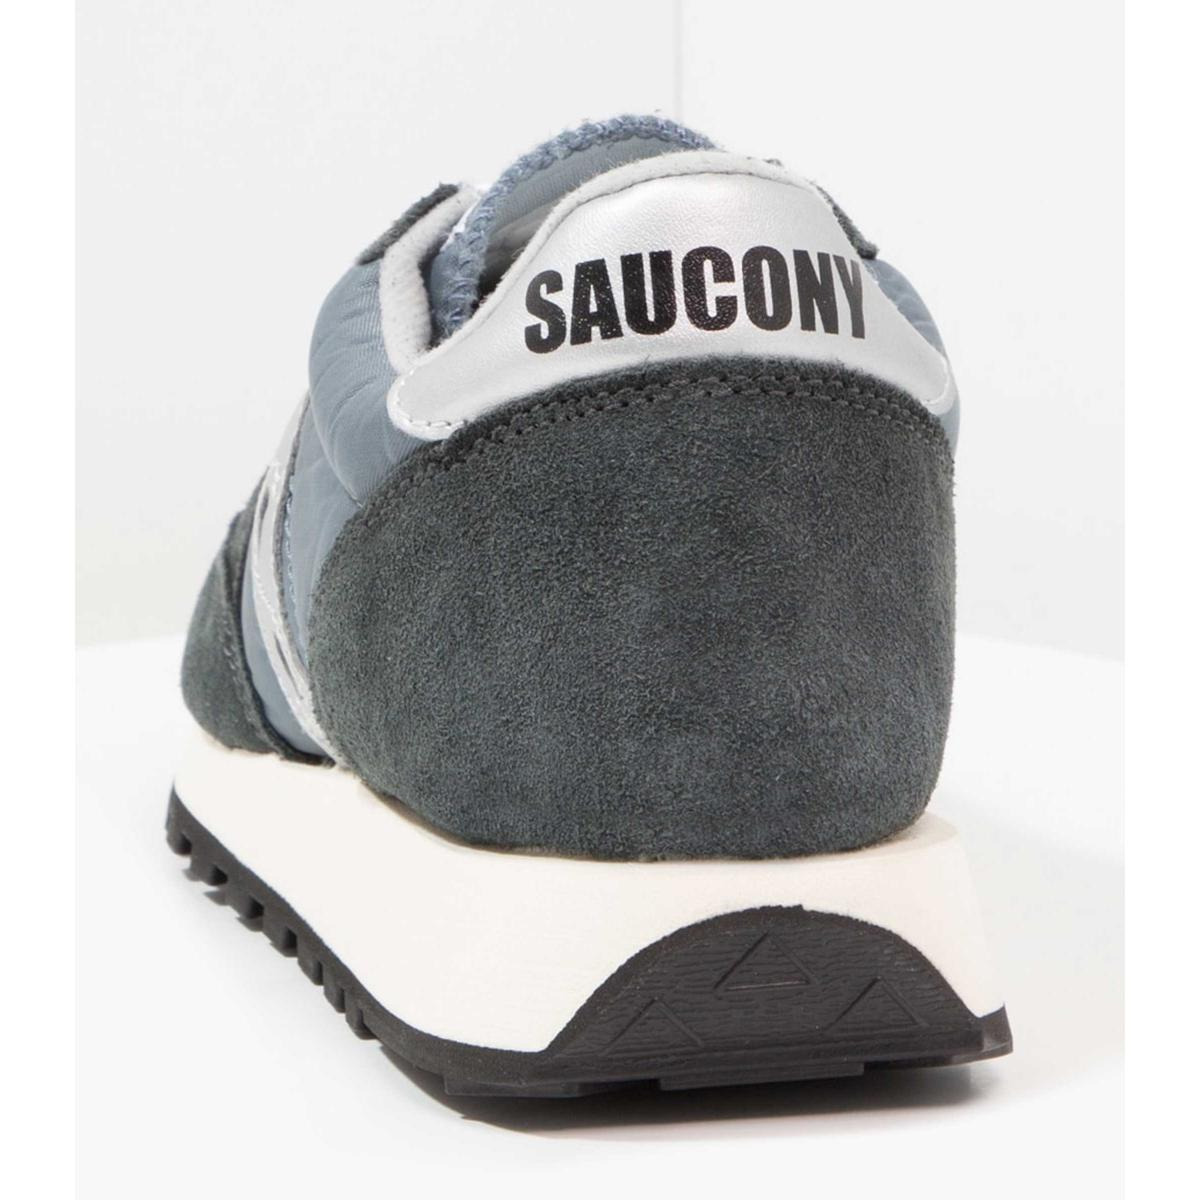 Scarpe Saucony Jazz Original Vintage - Uomo S70368-4 www.montorostore.it